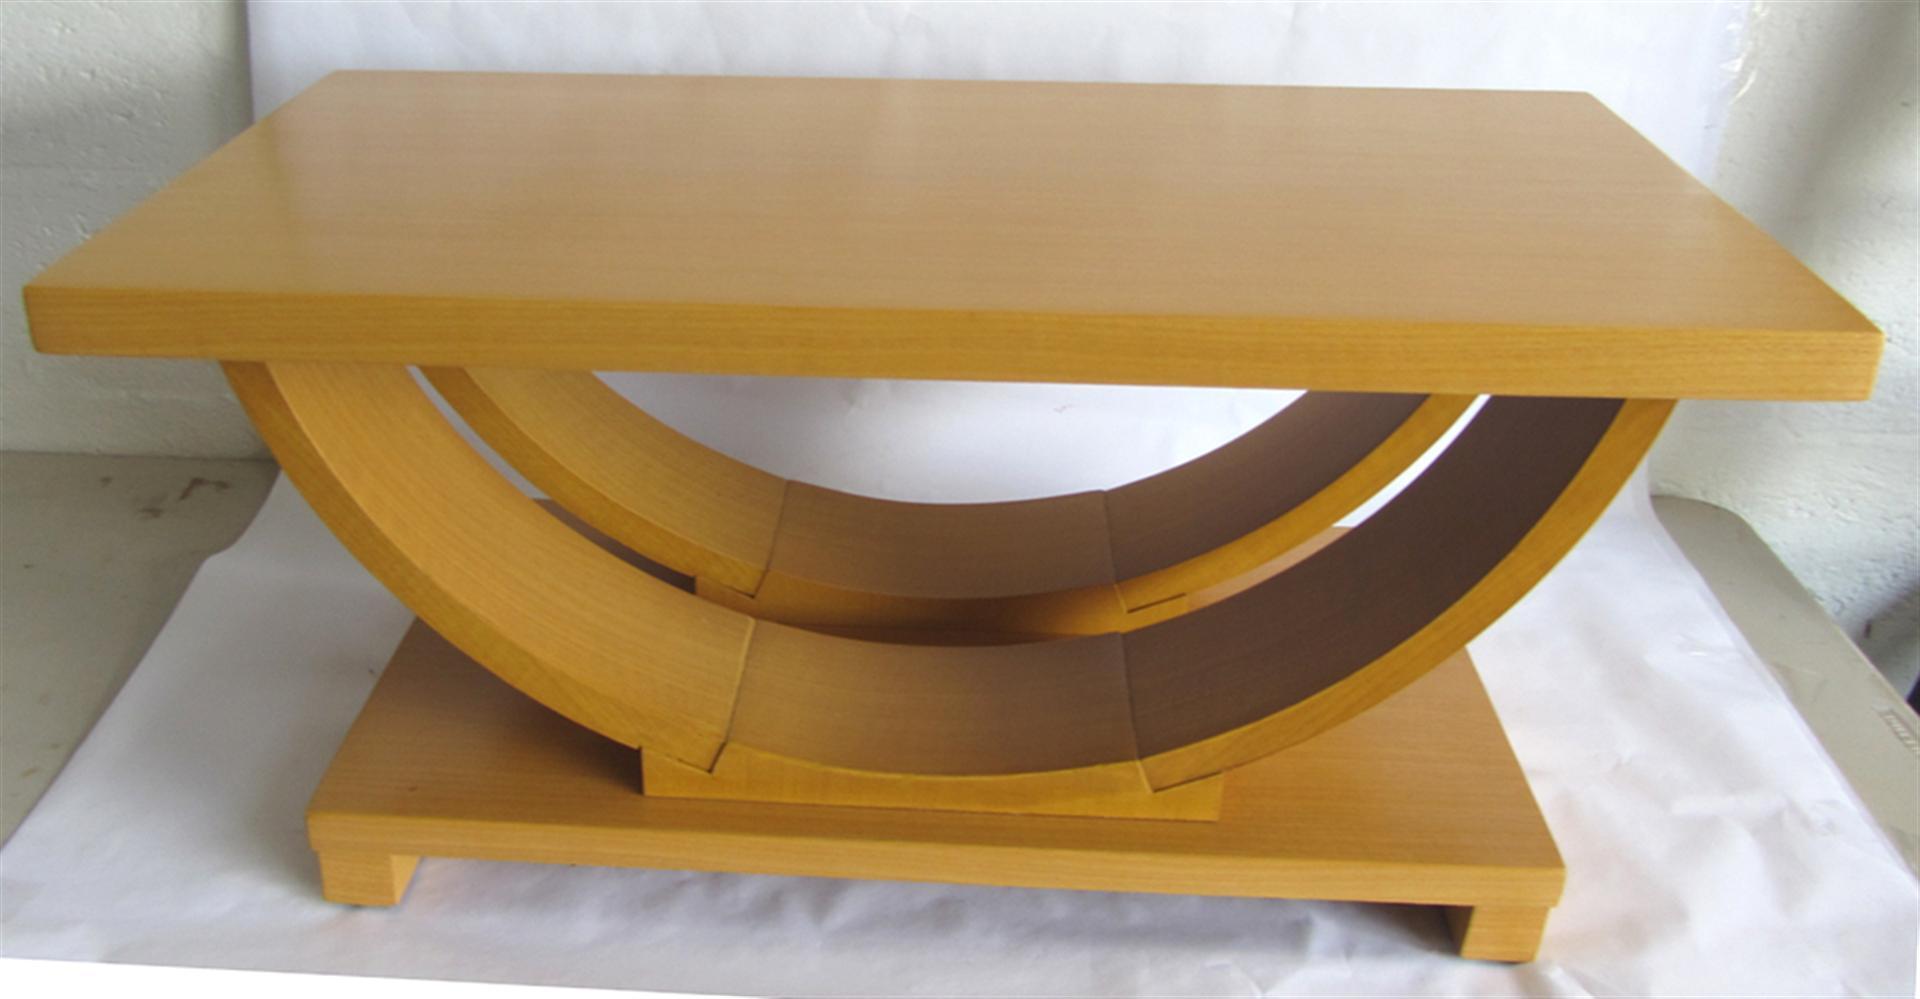 Modernage American Art Deco Streamline Blond Coffee Table Modernism